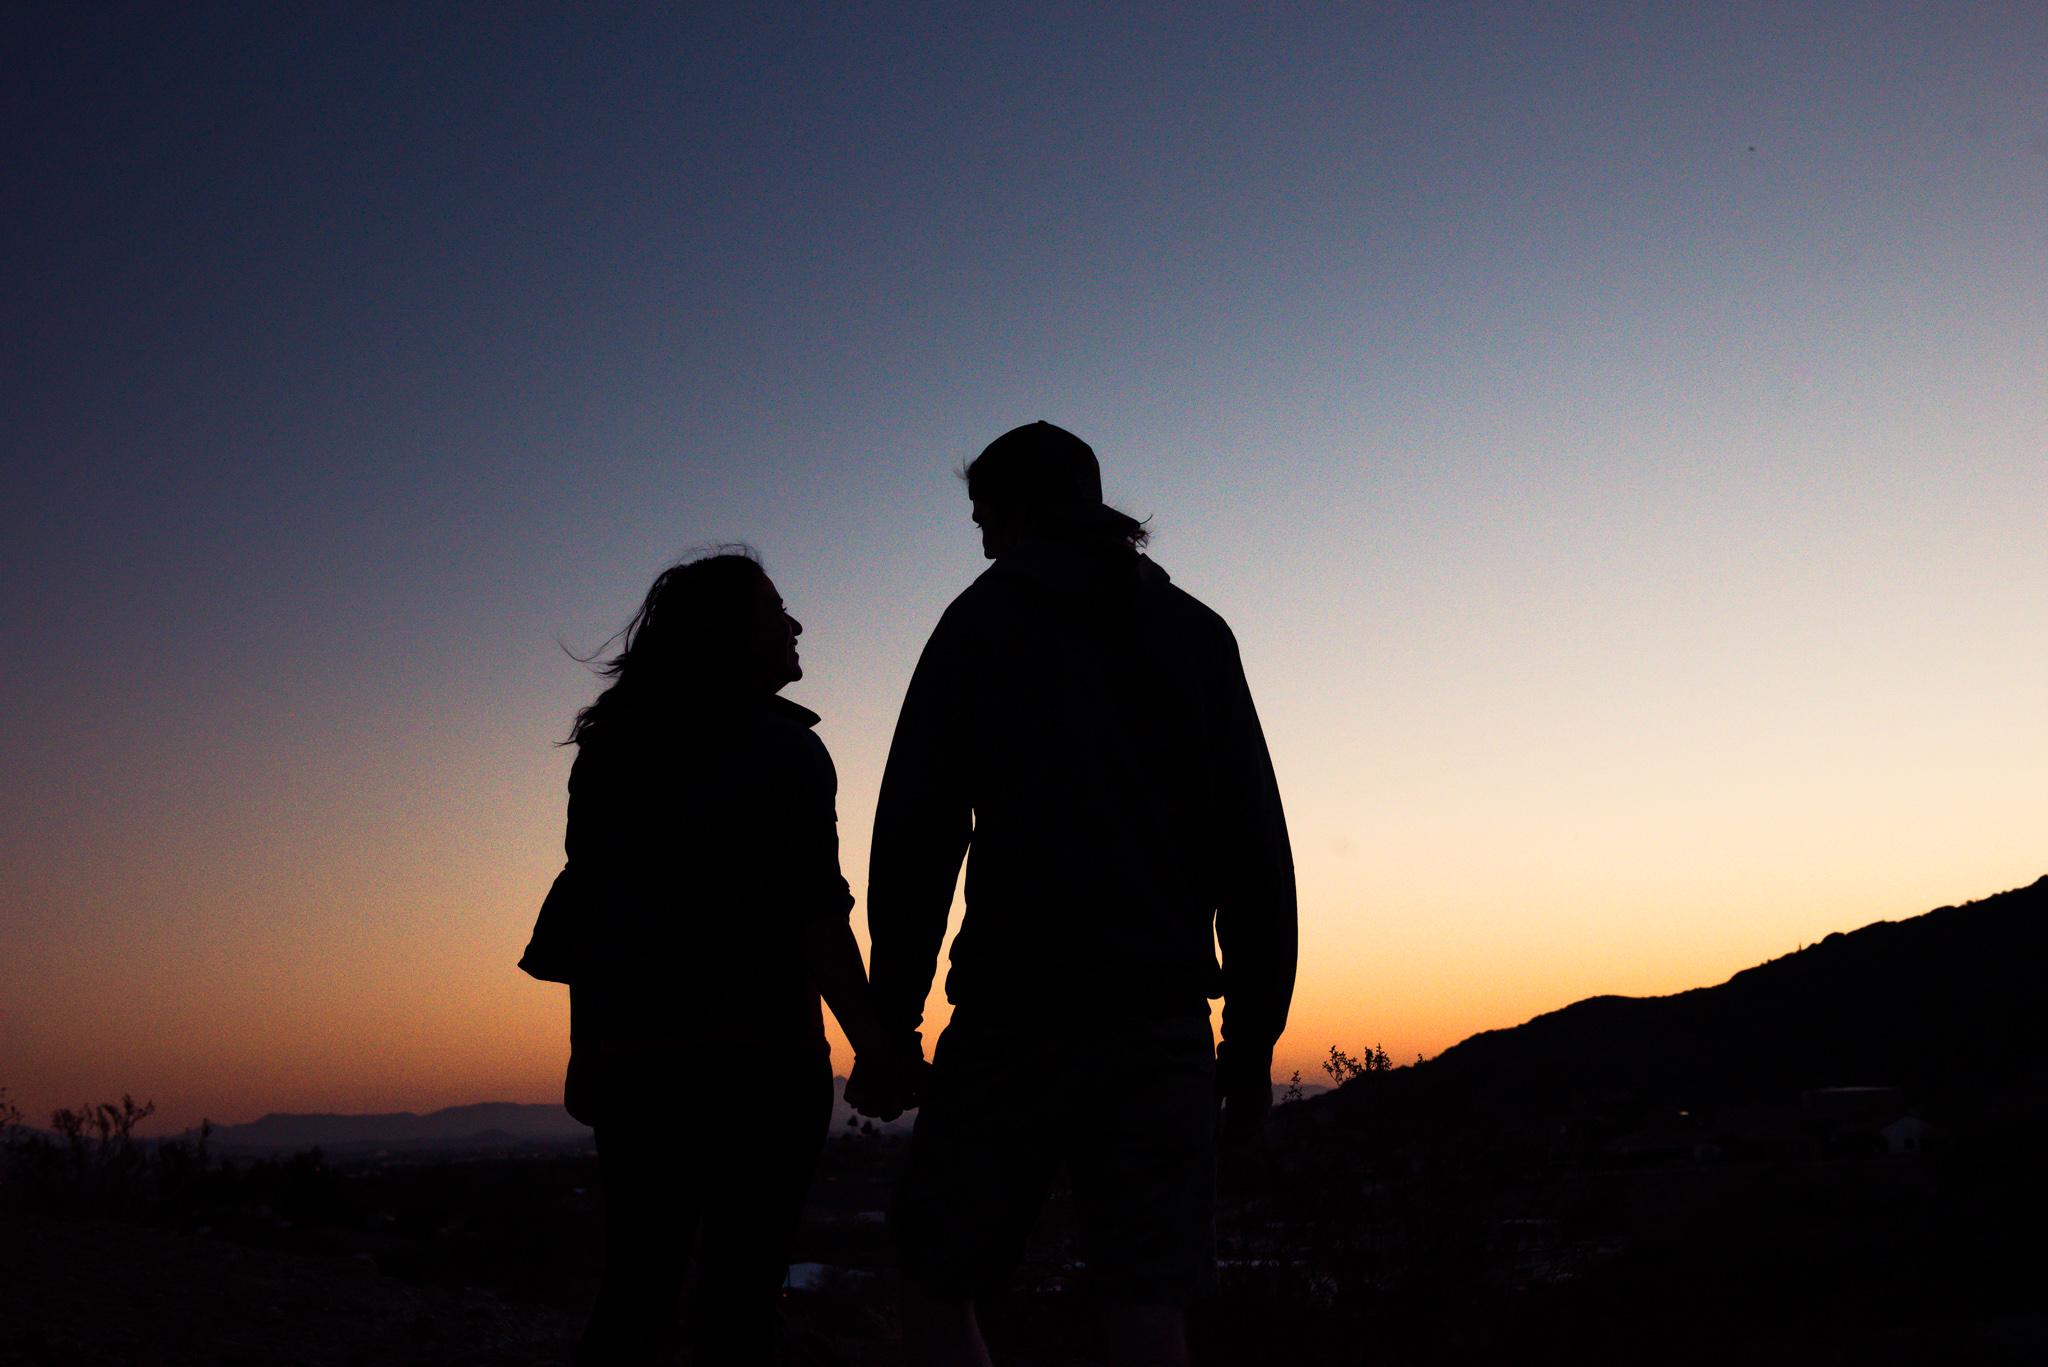 couple-photos-scottsdale-az-andrew-ybanez-elementalfotos.jpg